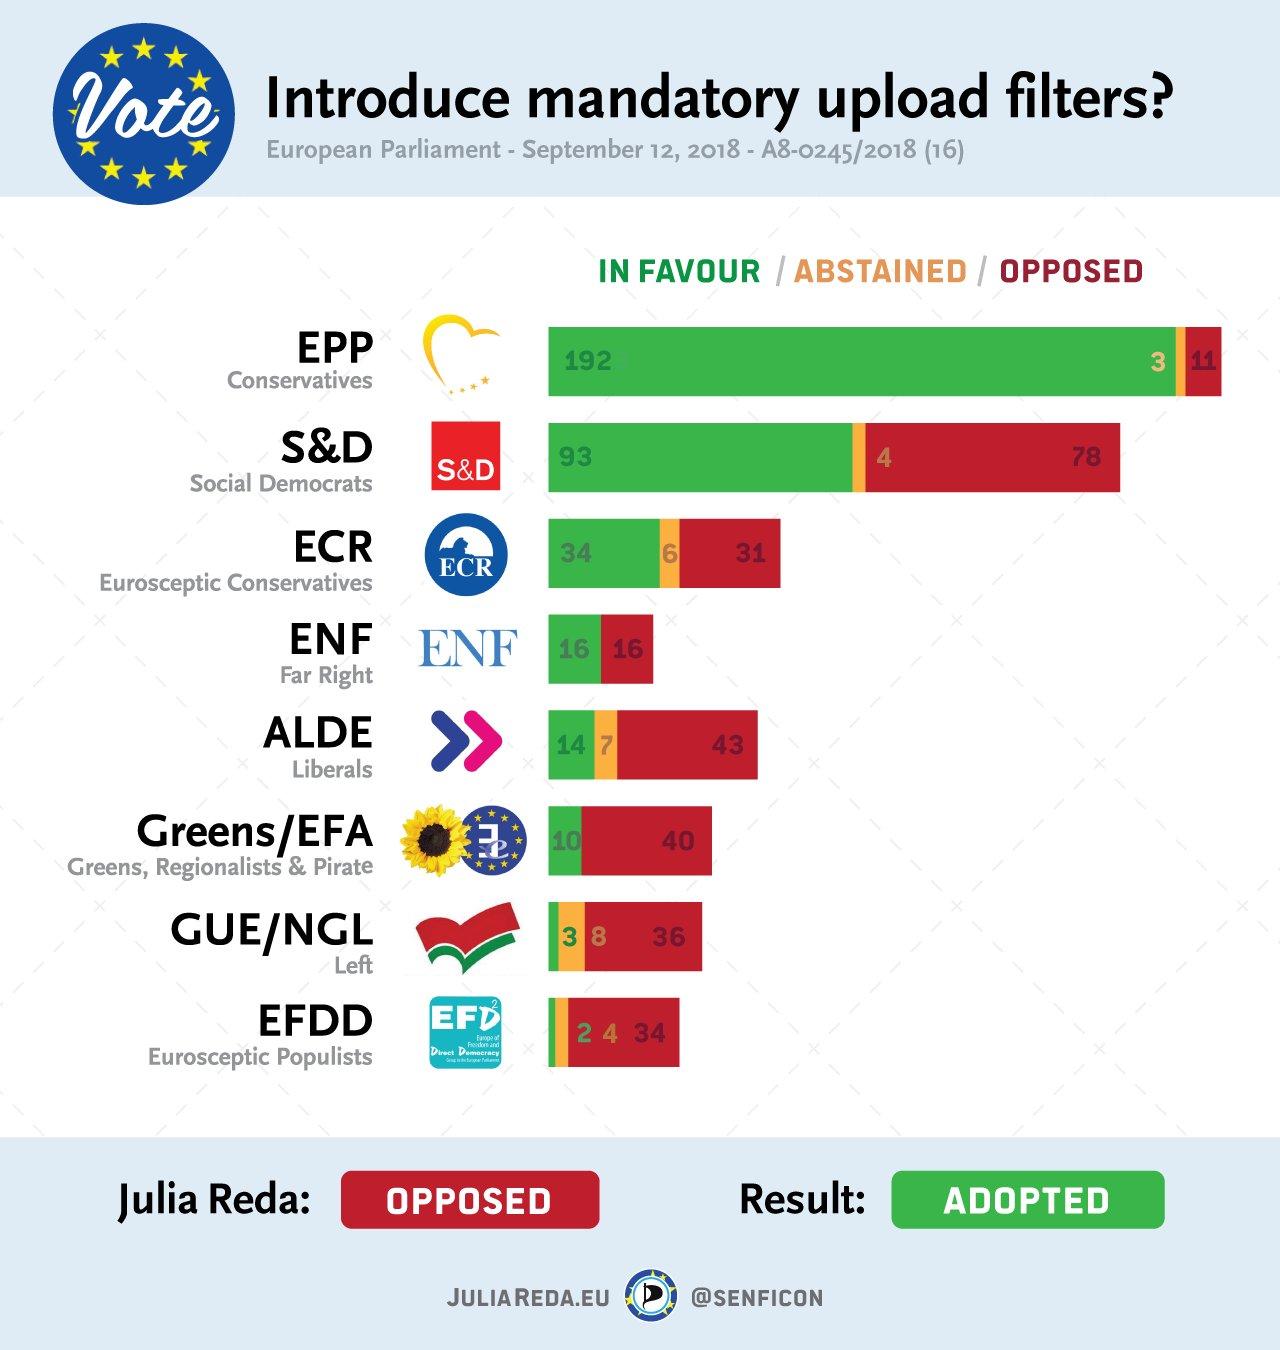 EU Passes new Controversial Internet Law re: Memes, Link Tax & Upload Filter Dm5kGq5X0AANQZs.jpglarge